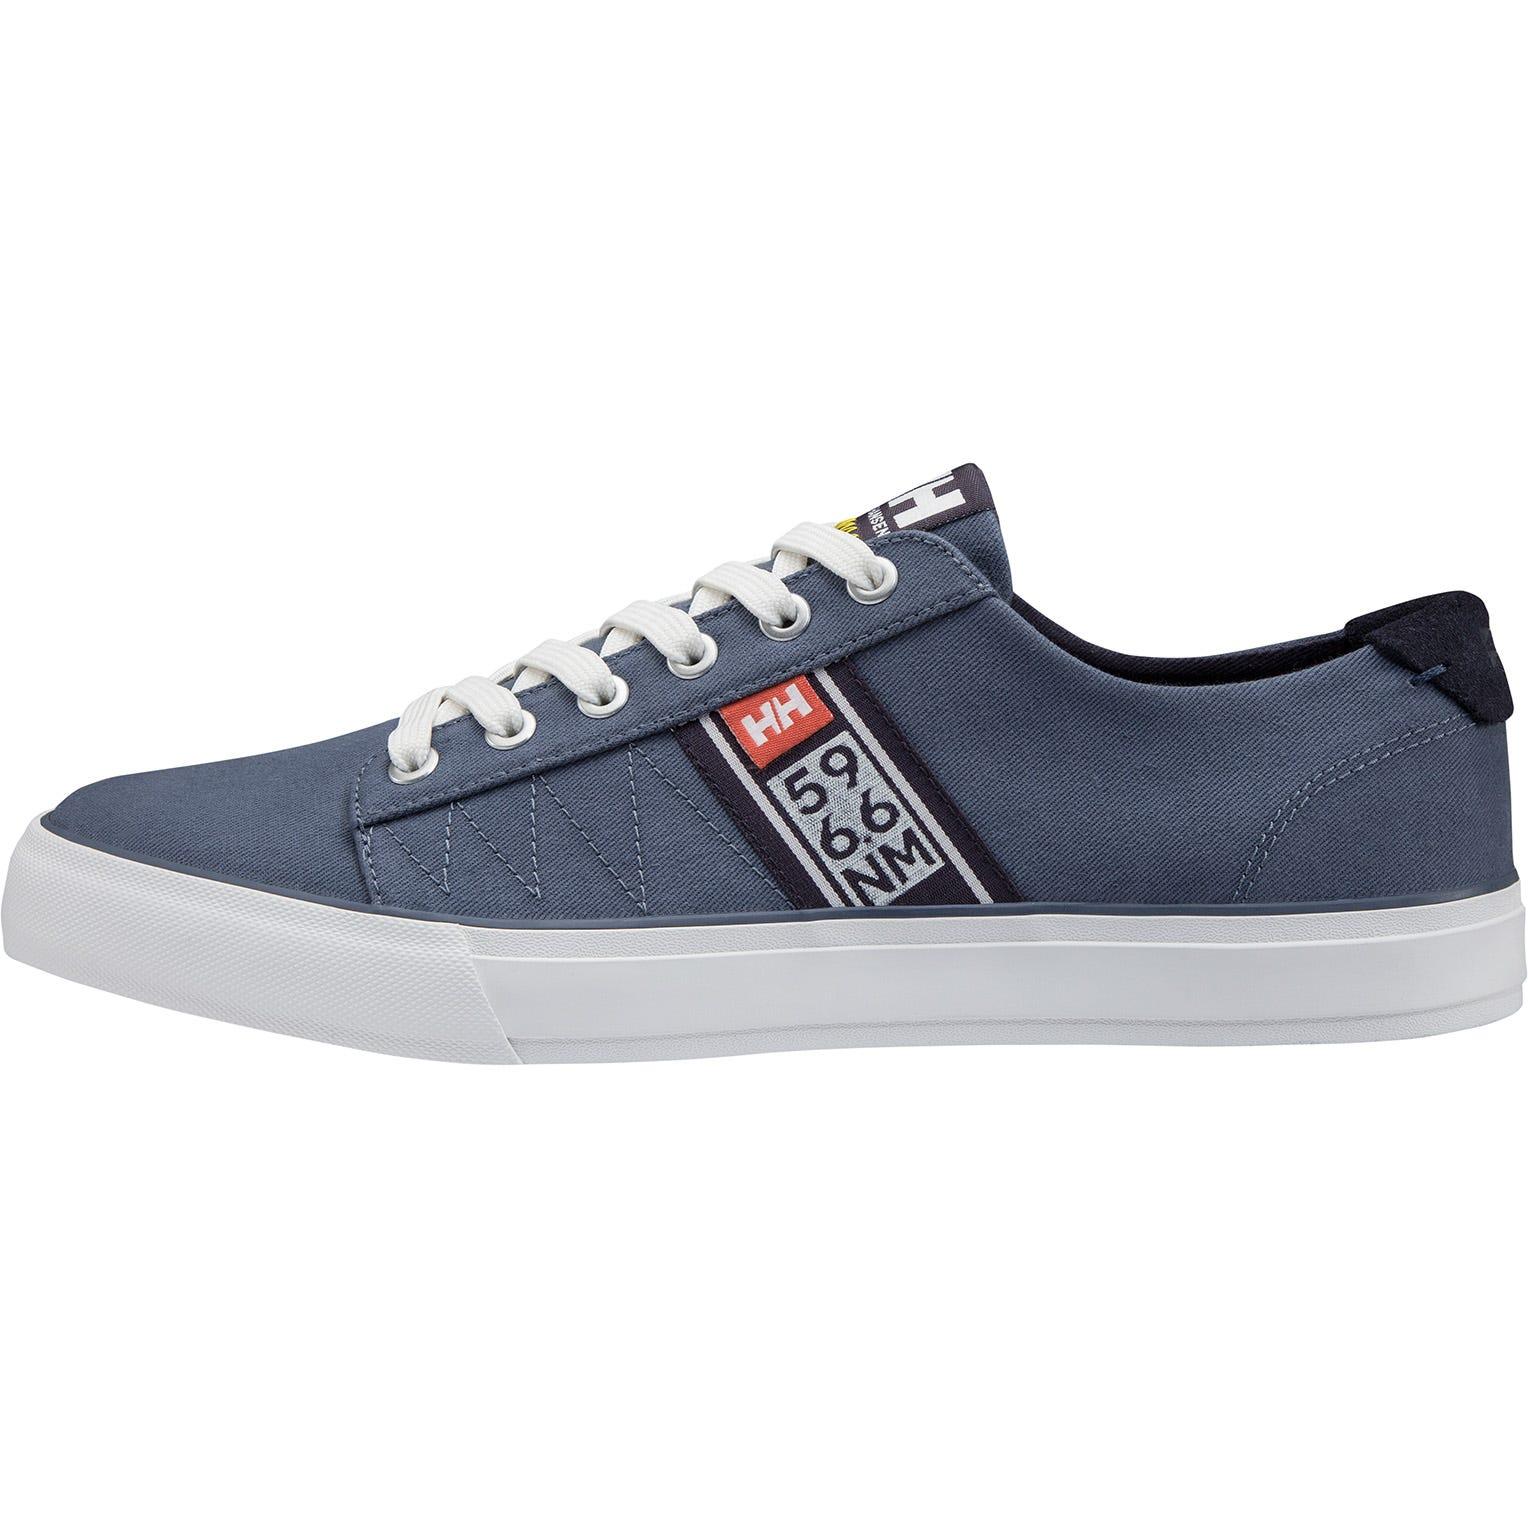 Helly Hansen Salt Flag F1 Mens Casual Shoe Blue 42.5/9